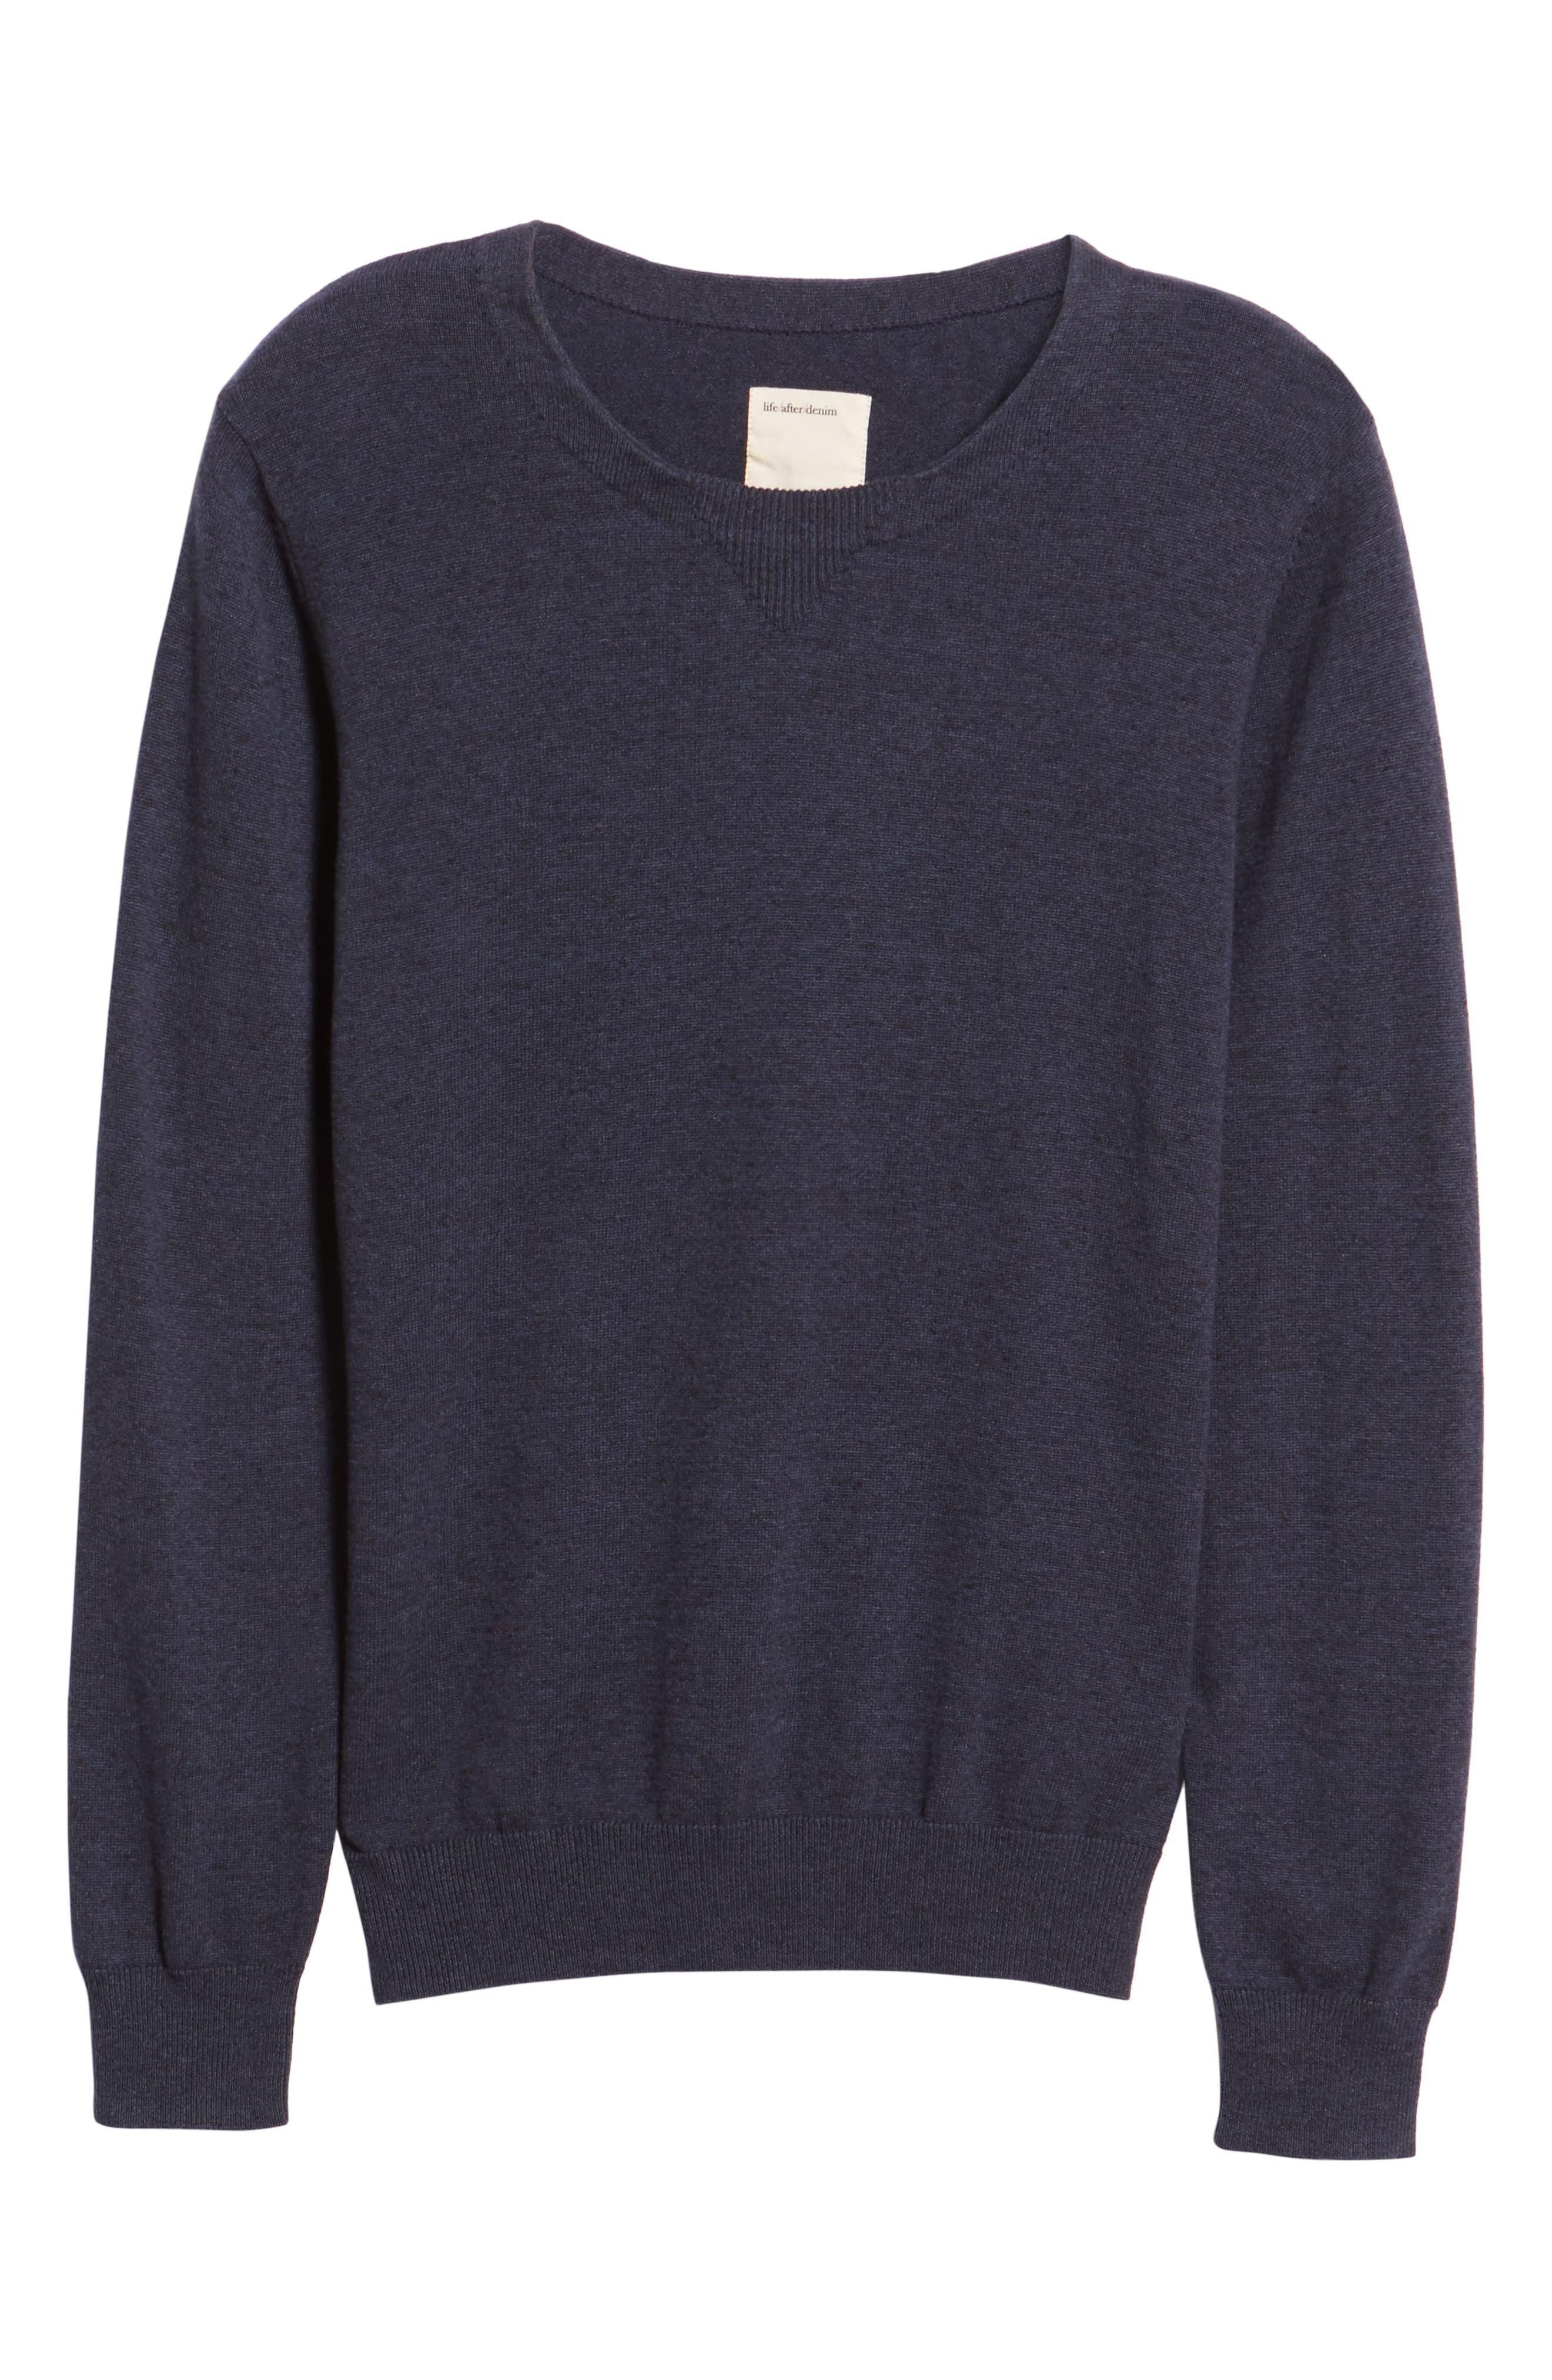 McGill Slim Fit Crewneck Sweater,                             Alternate thumbnail 6, color,                             HEATHER NAVY